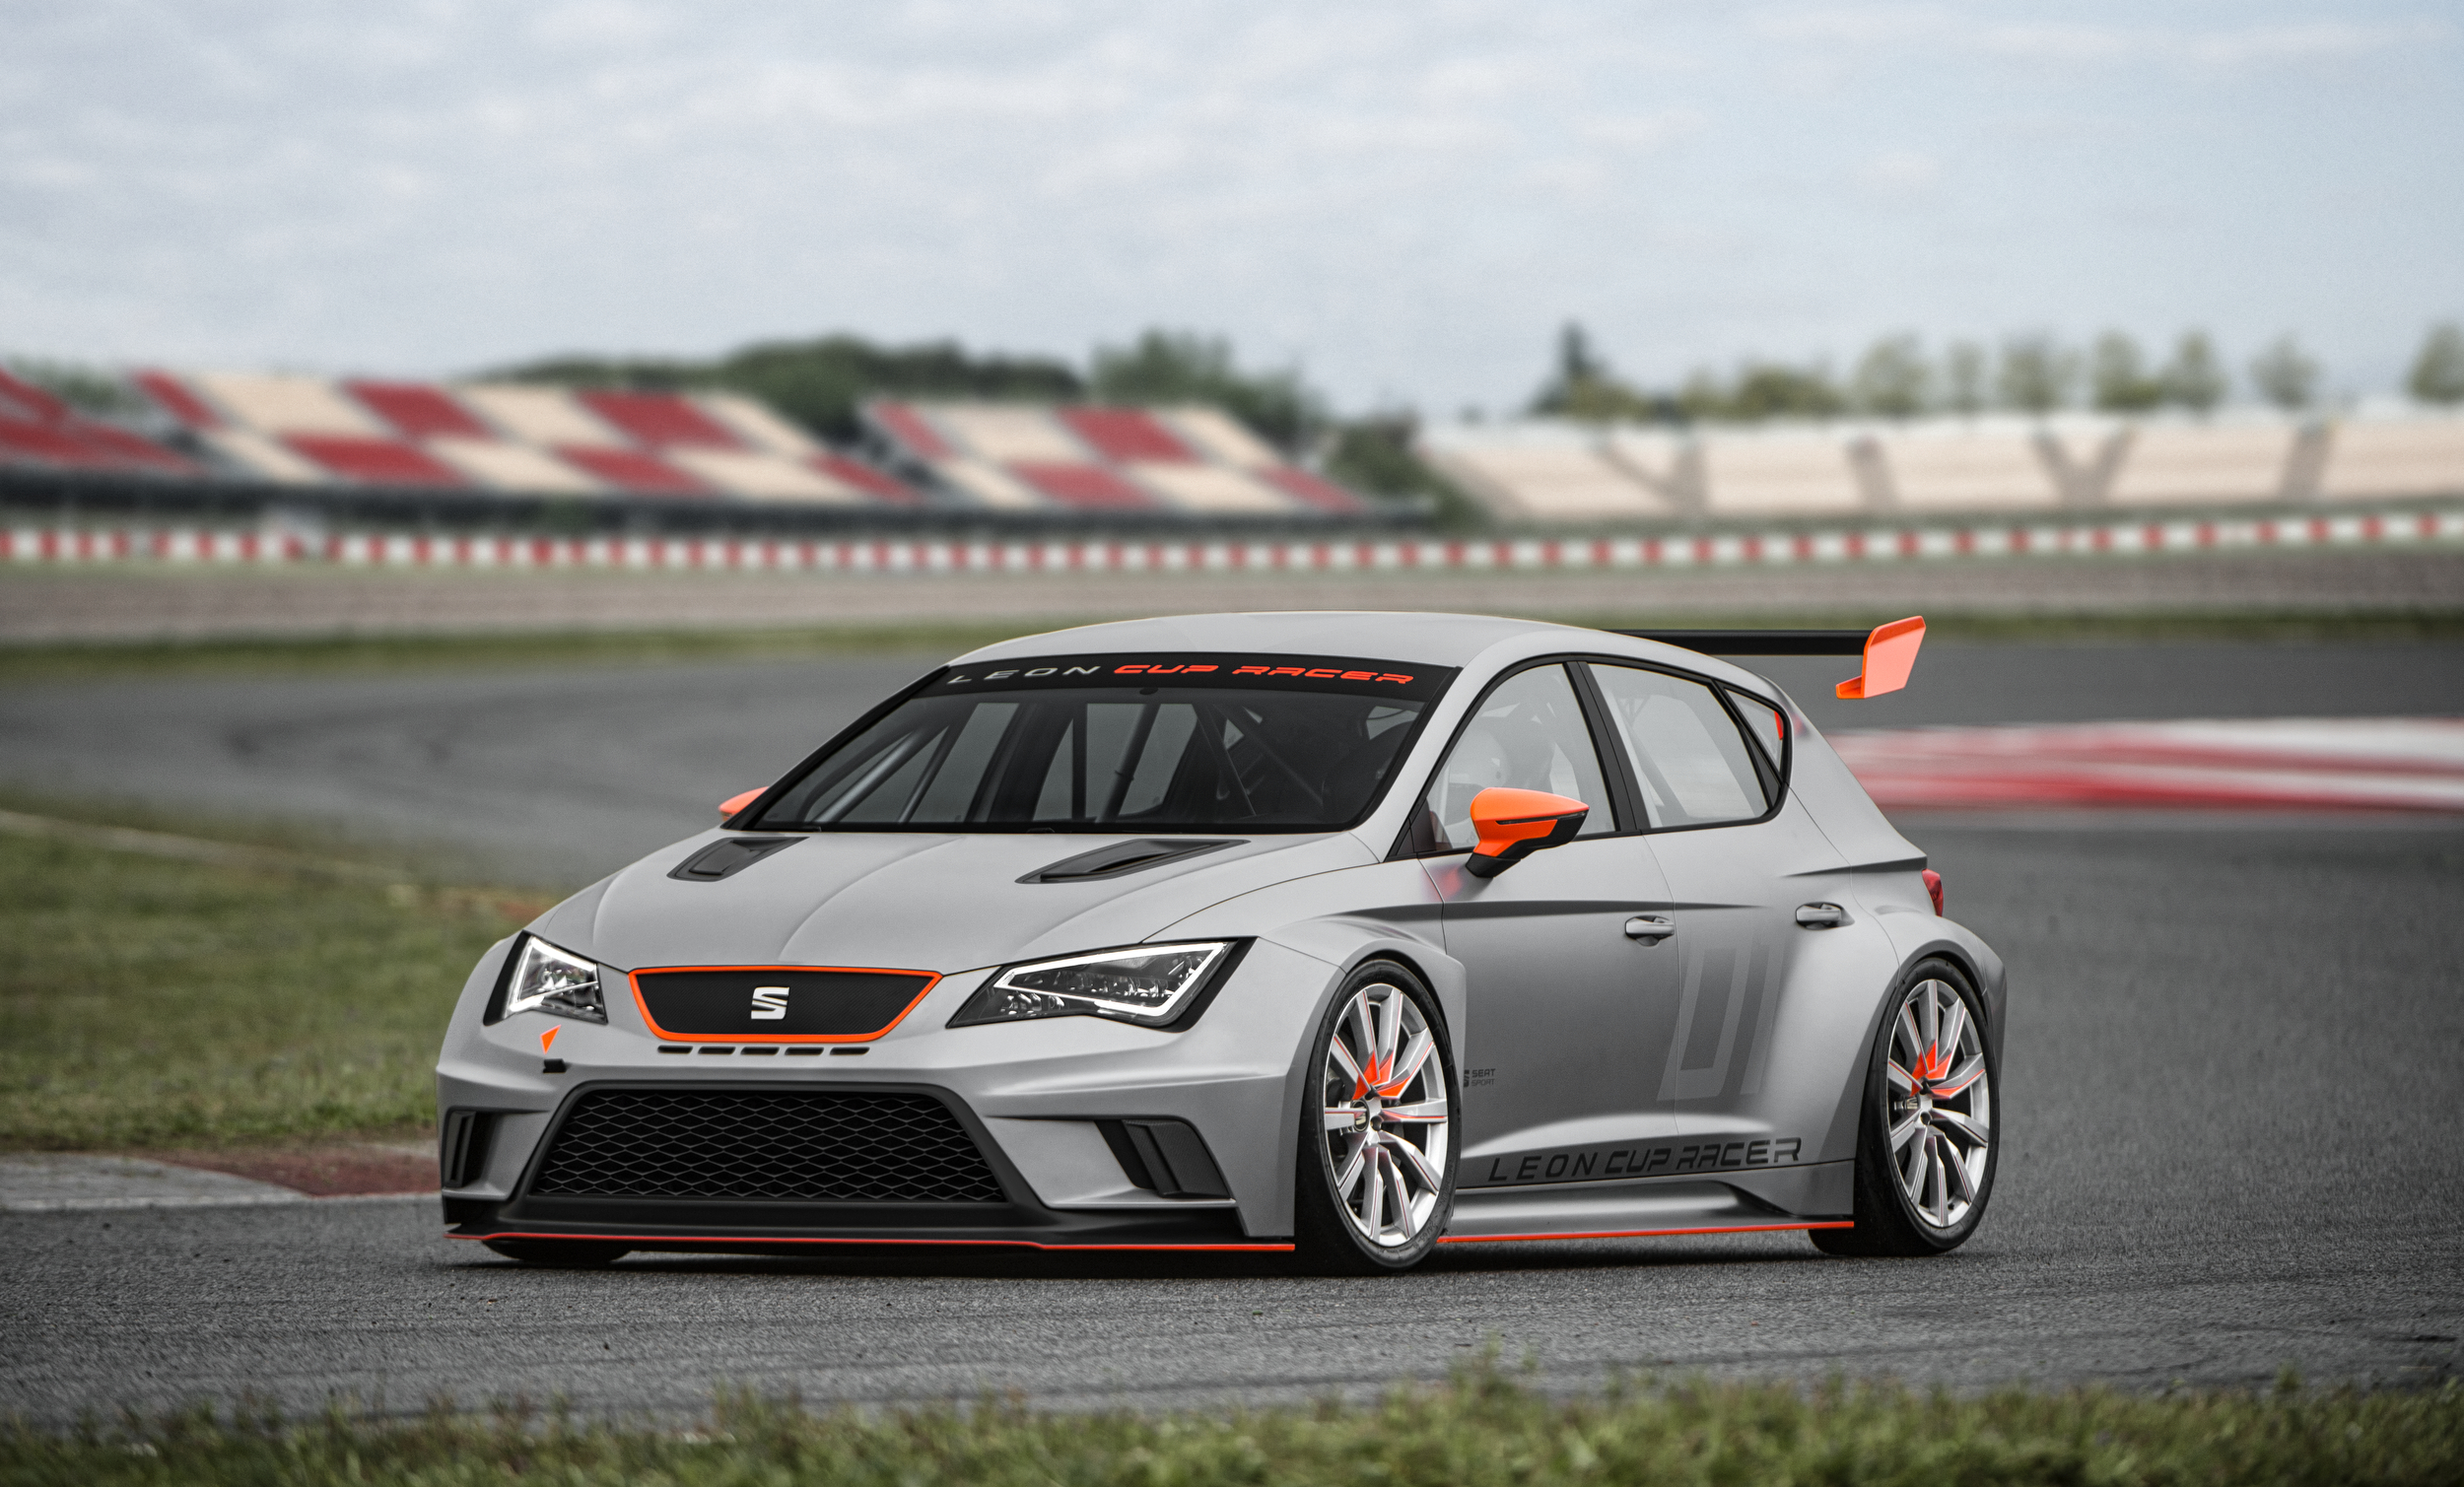 Leon Cup Racer09 110x60